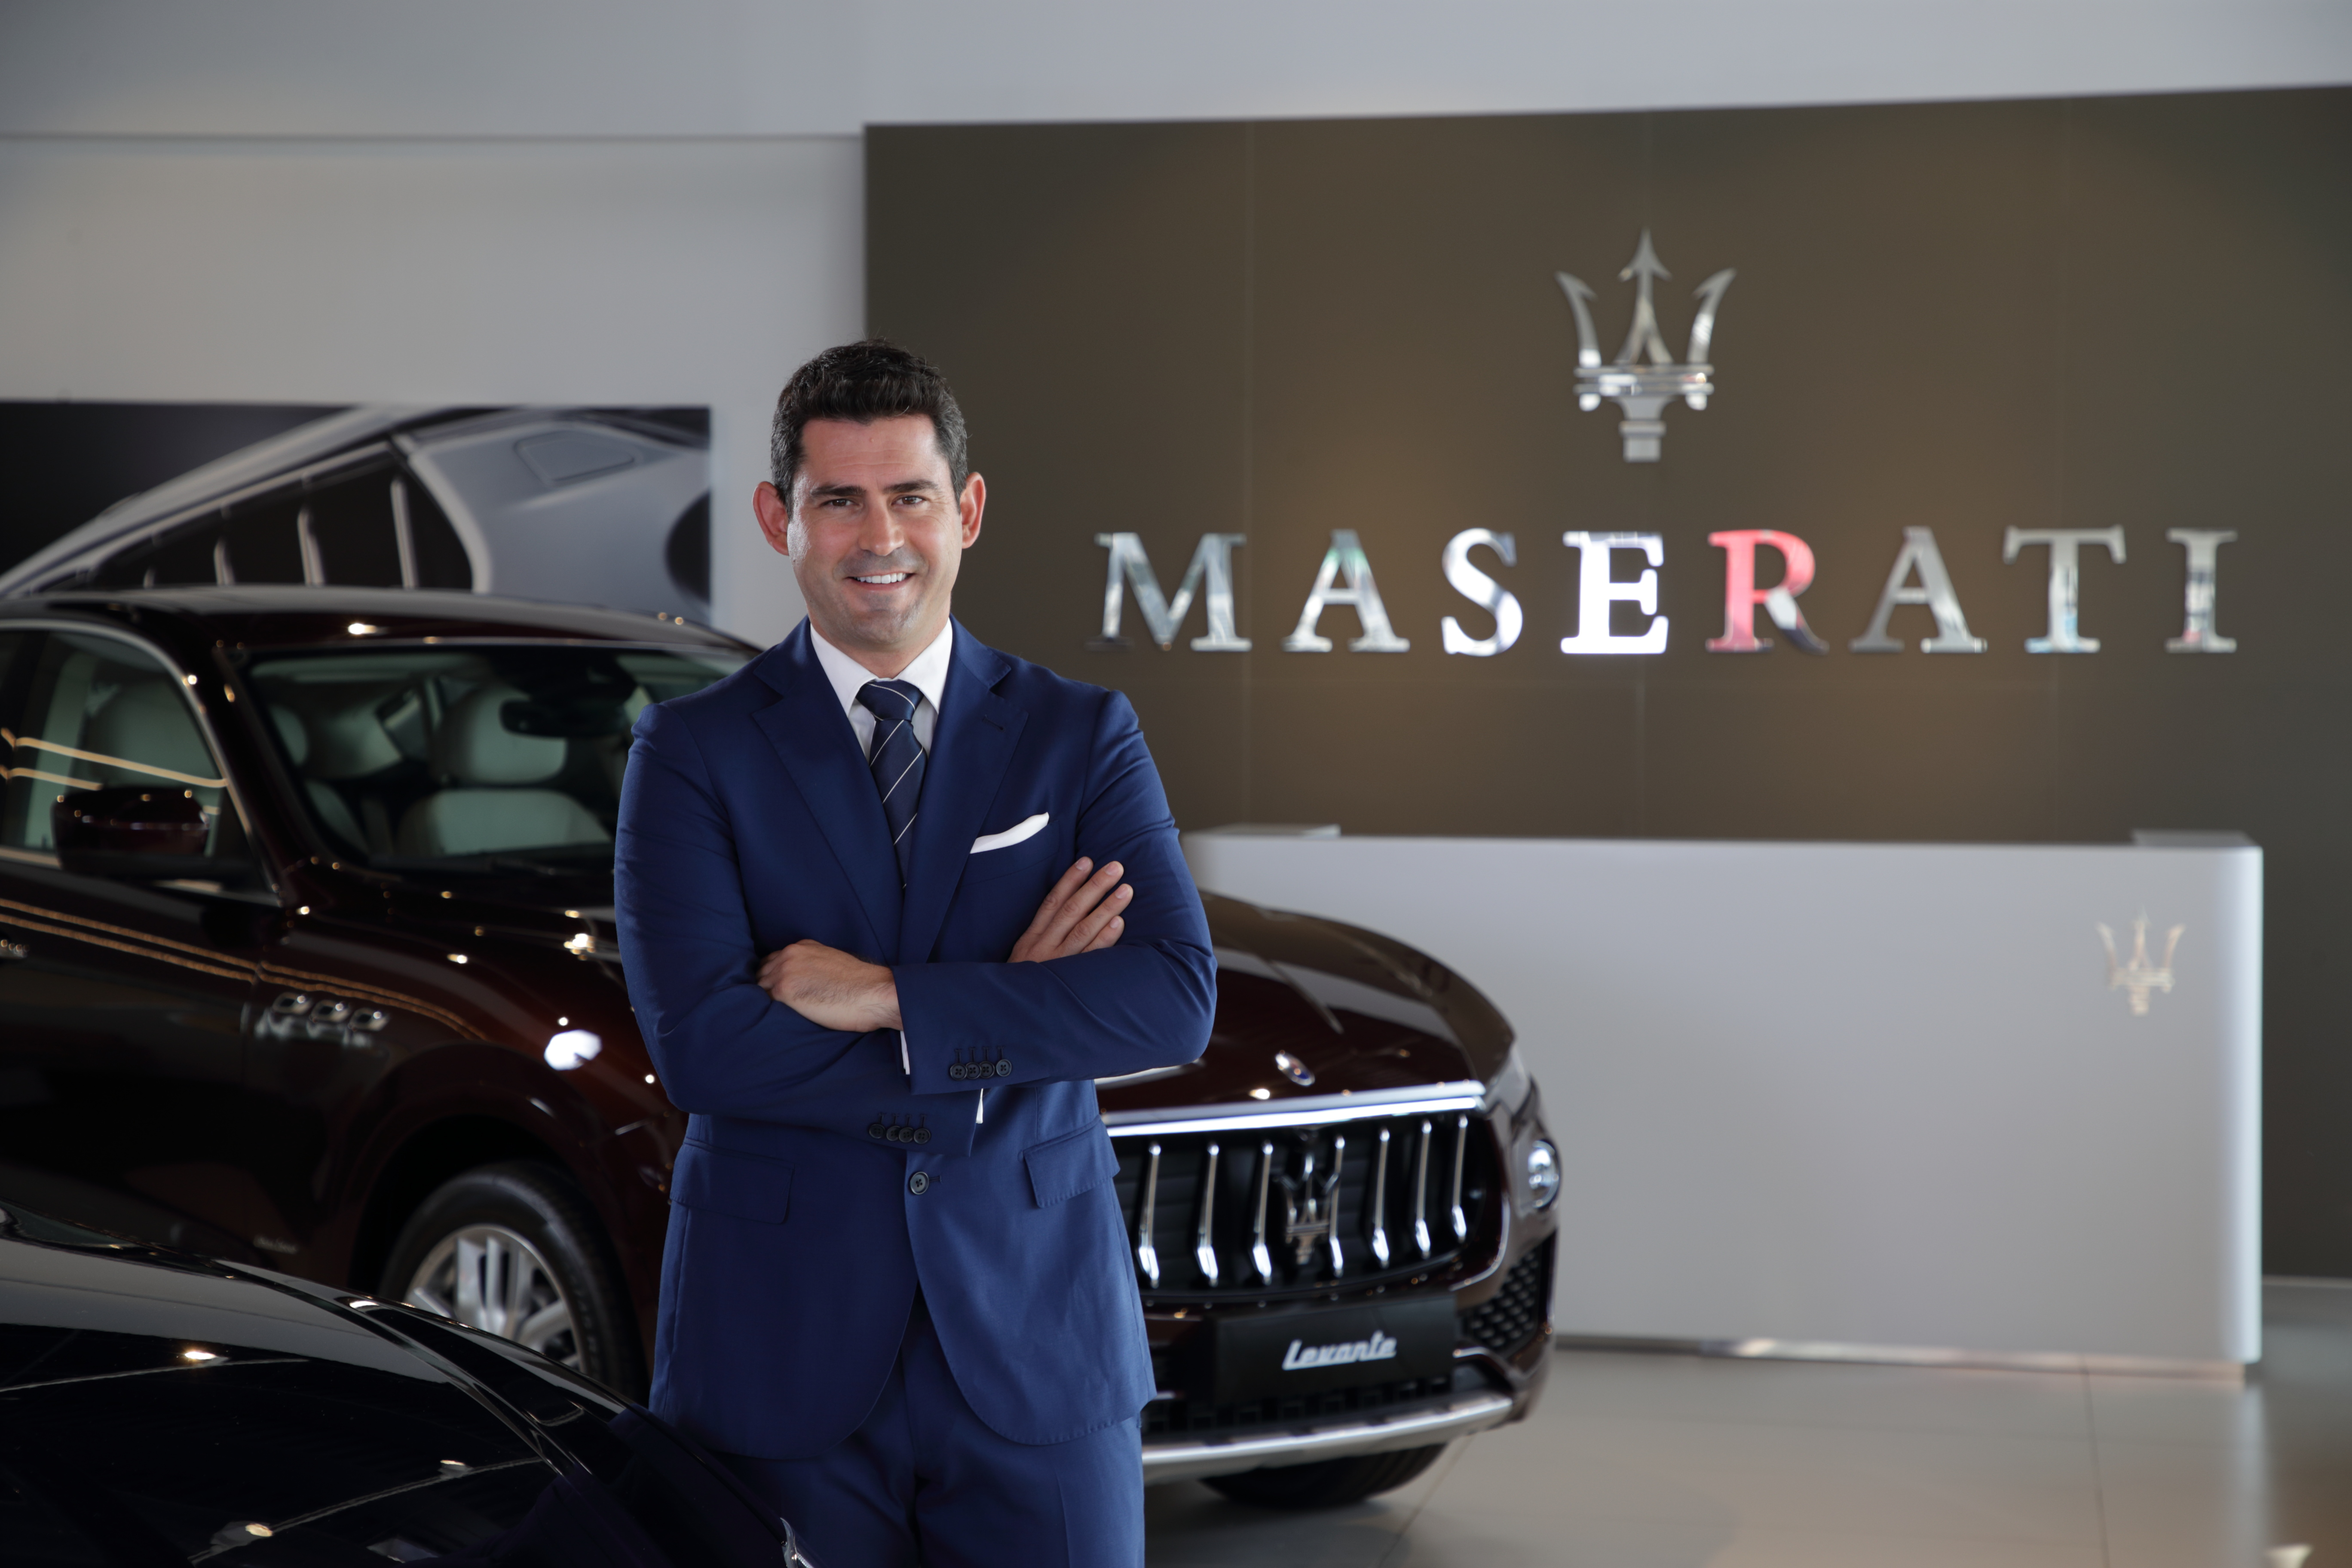 Maserati apresenta Dan García como novo diretor comercial e de desenvolvimento de rede na Península Ibérica